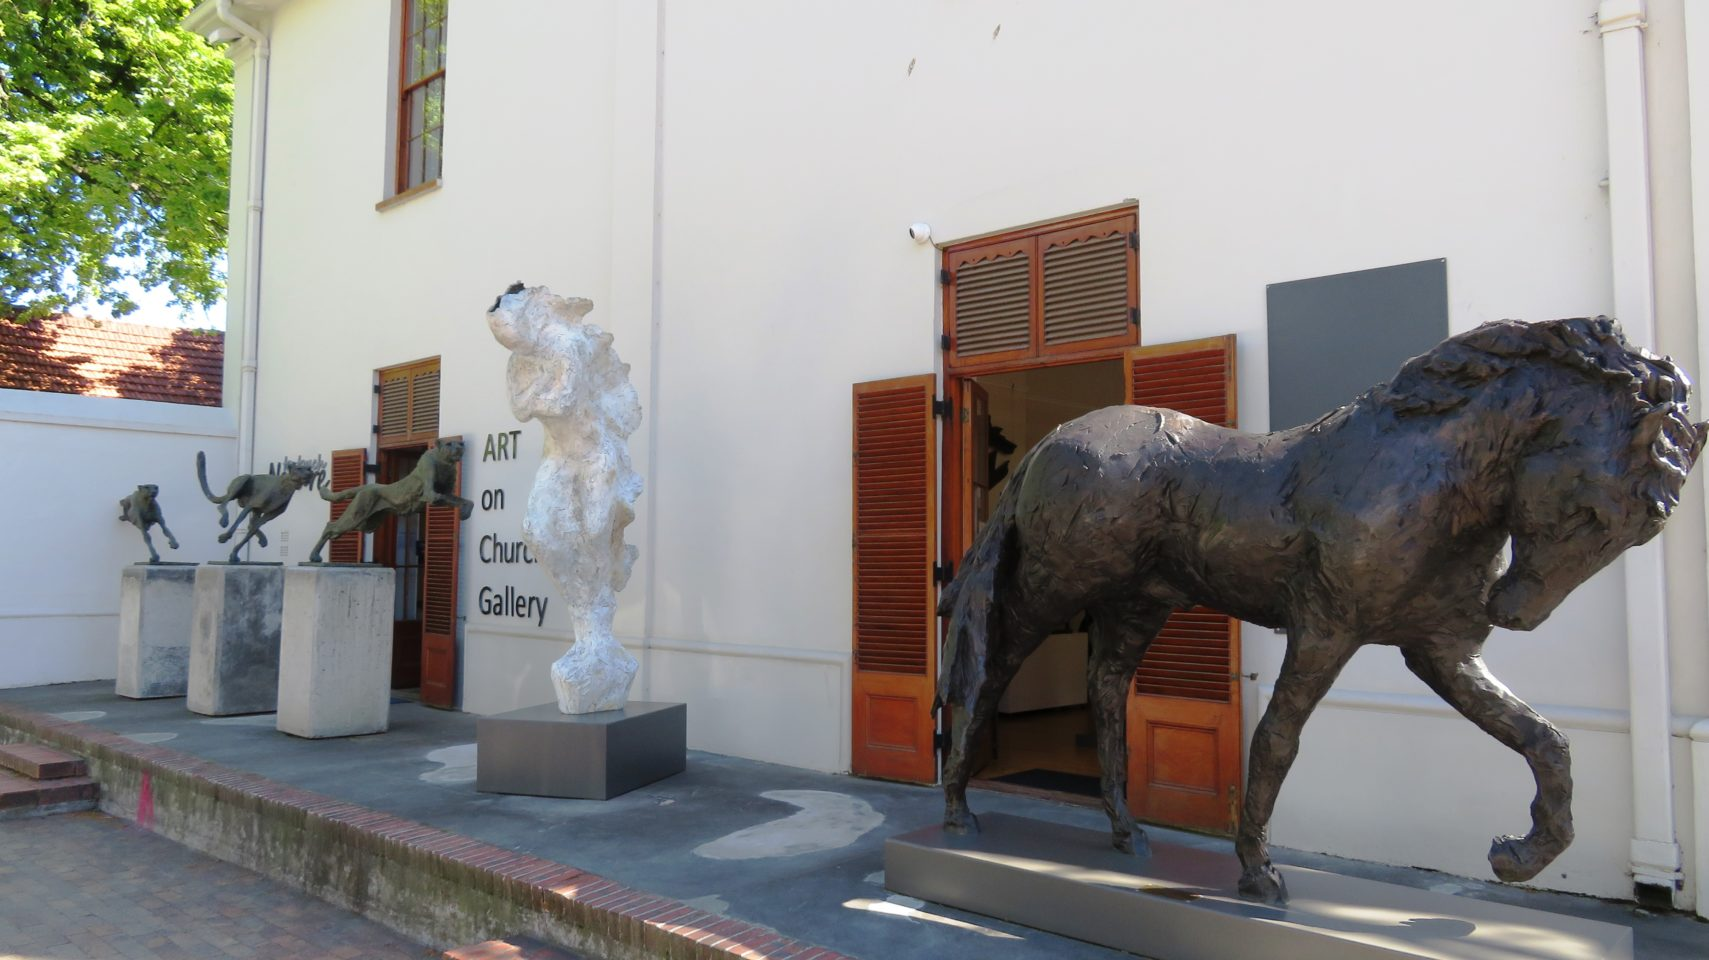 Art Gallery in Stellenbosch, South Africa